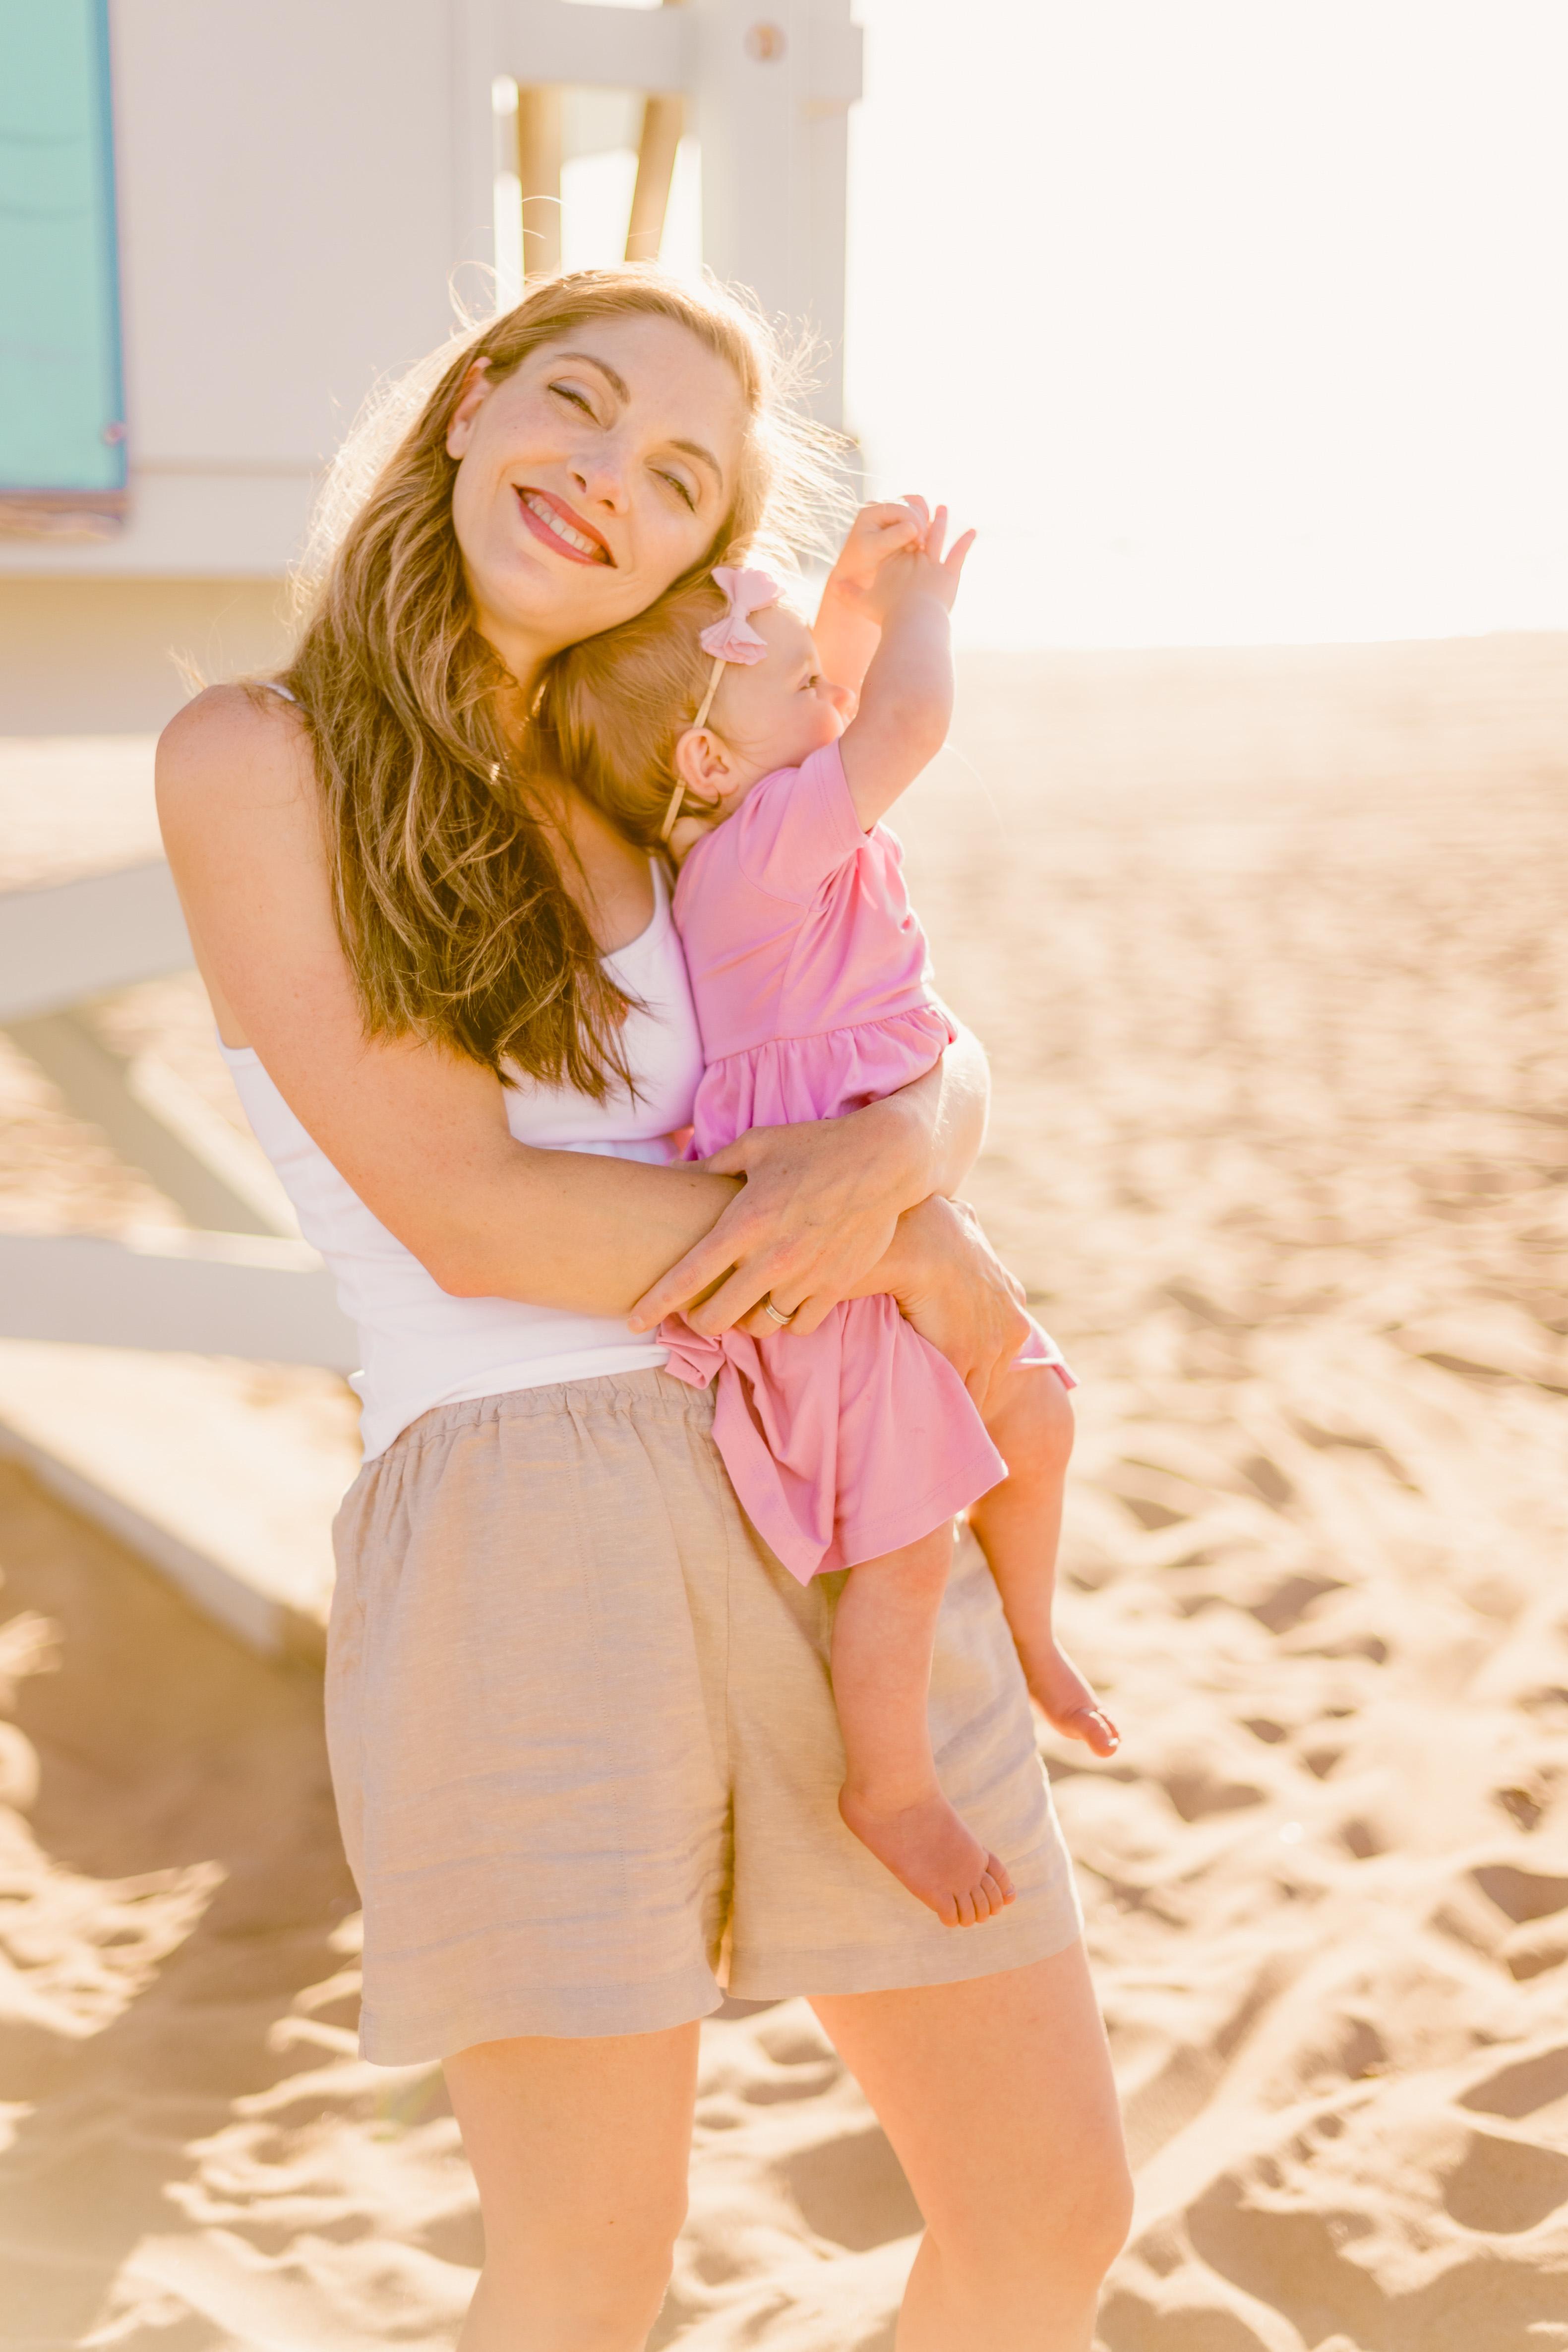 sunshine baby pink dress lifeguard tower